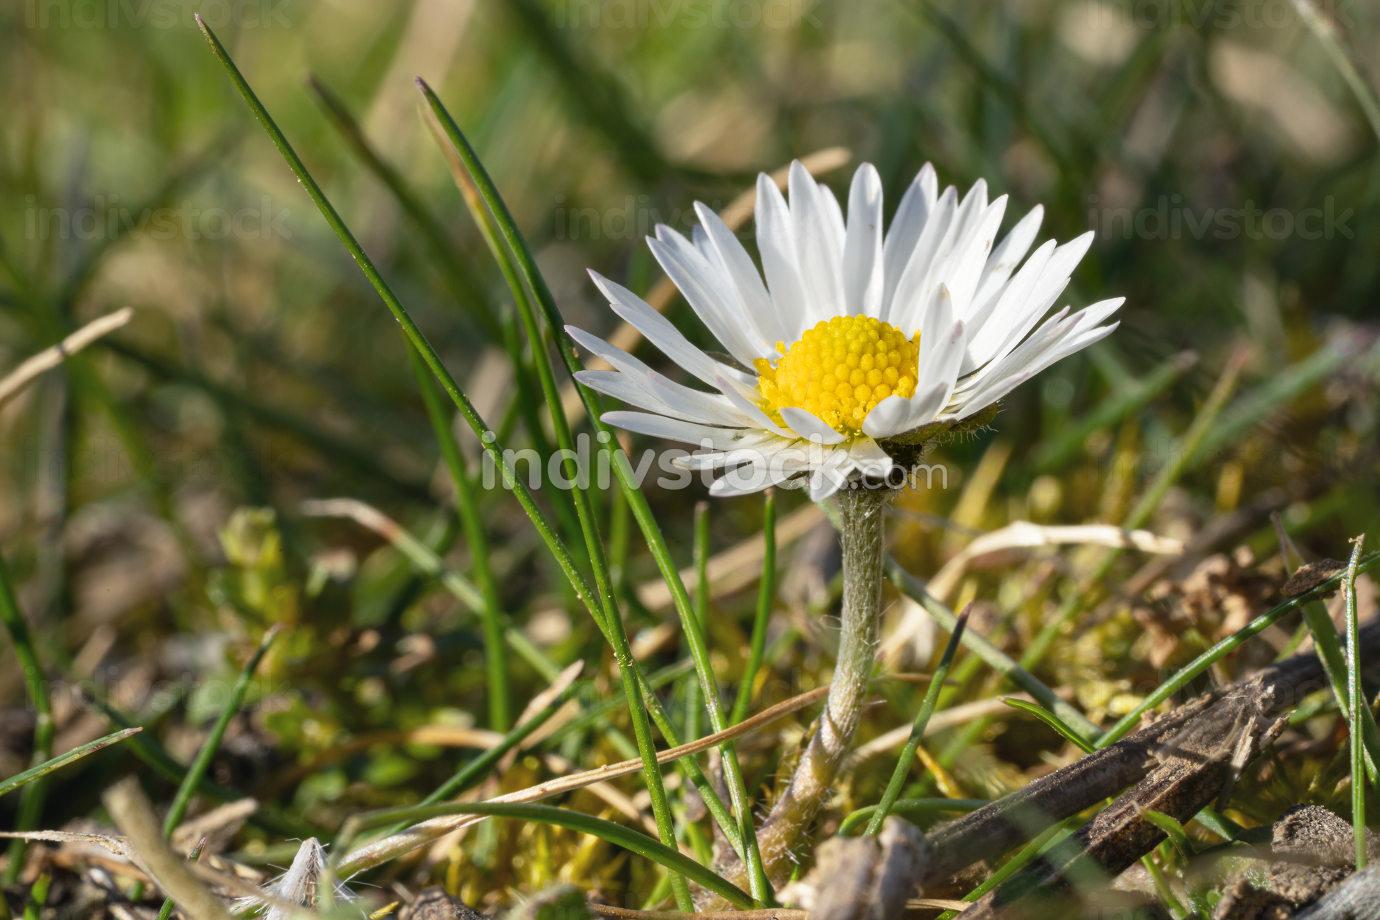 Common daisy Bellis perennis , the flower head